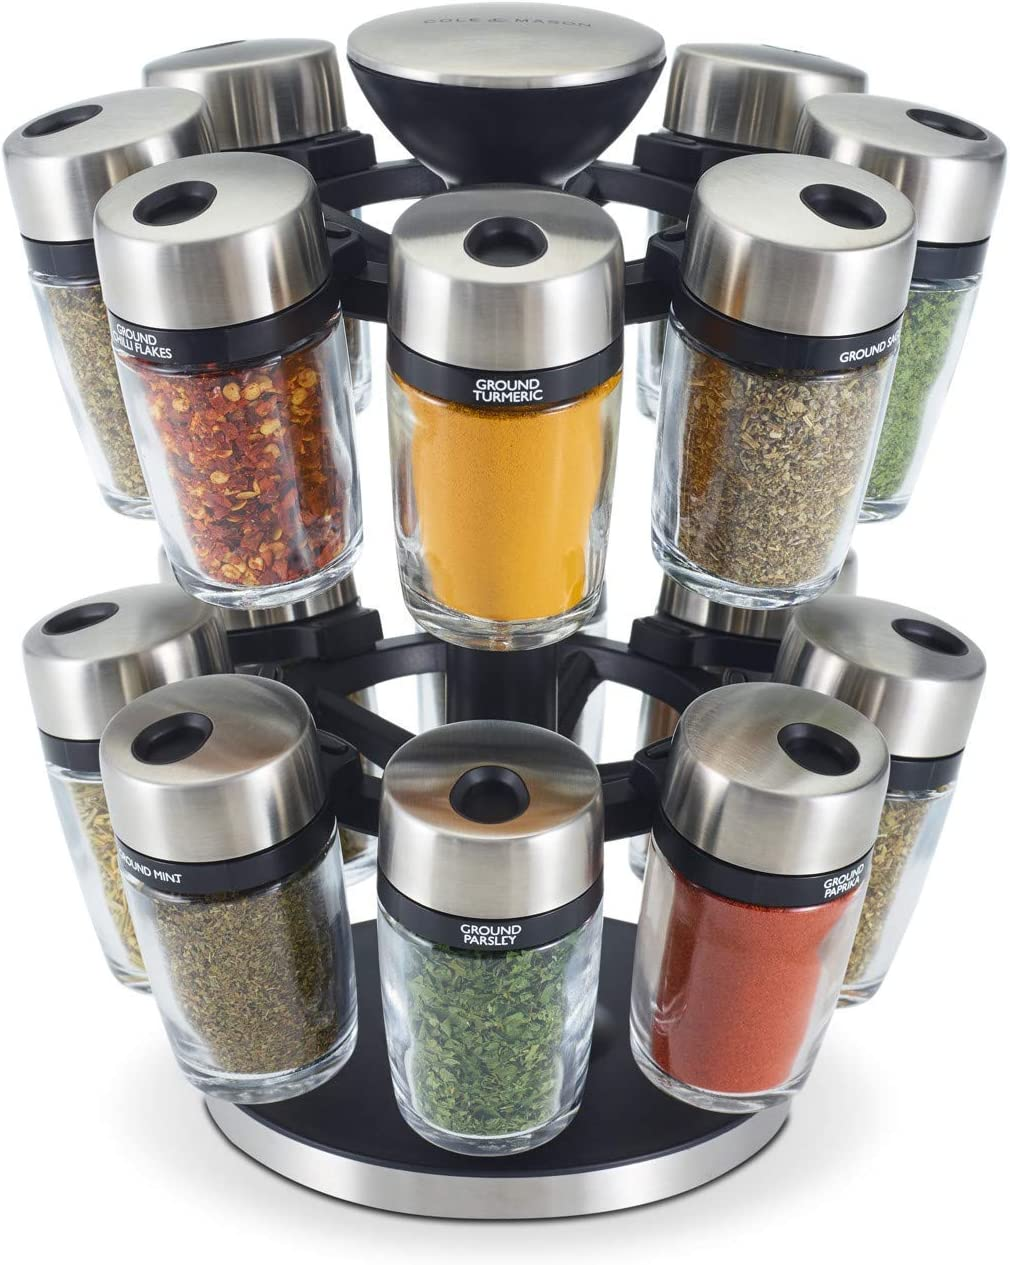 Cole Mason H121808U Super intense SALE Ranking TOP17 16 Jar Spice Carousel Medium Silv Herb